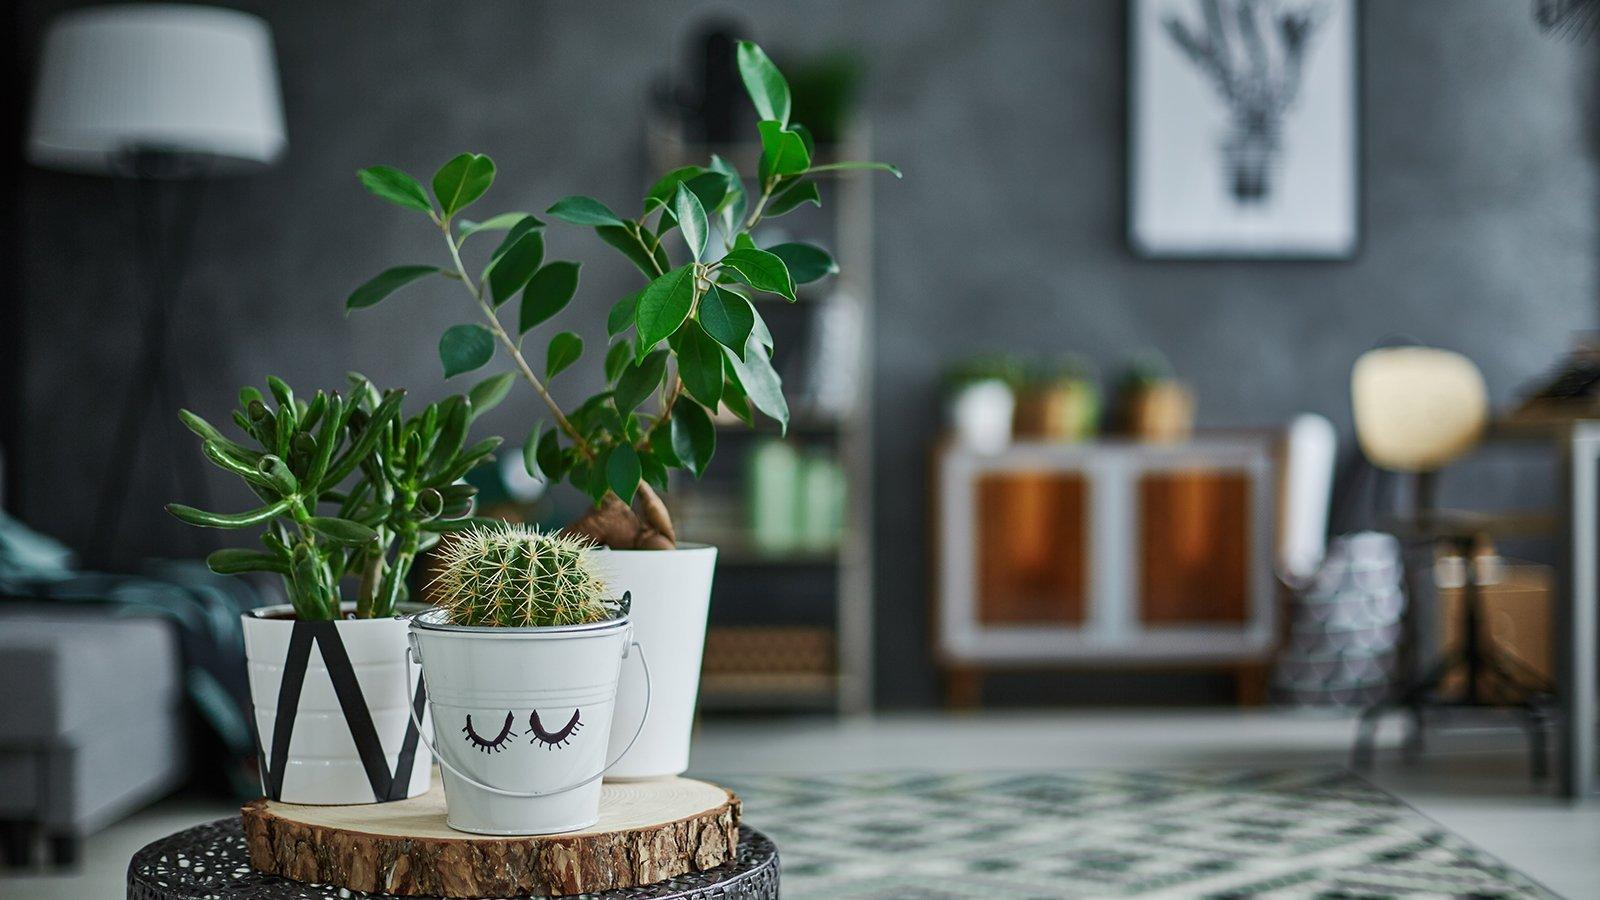 Decorative green houseplant in pot